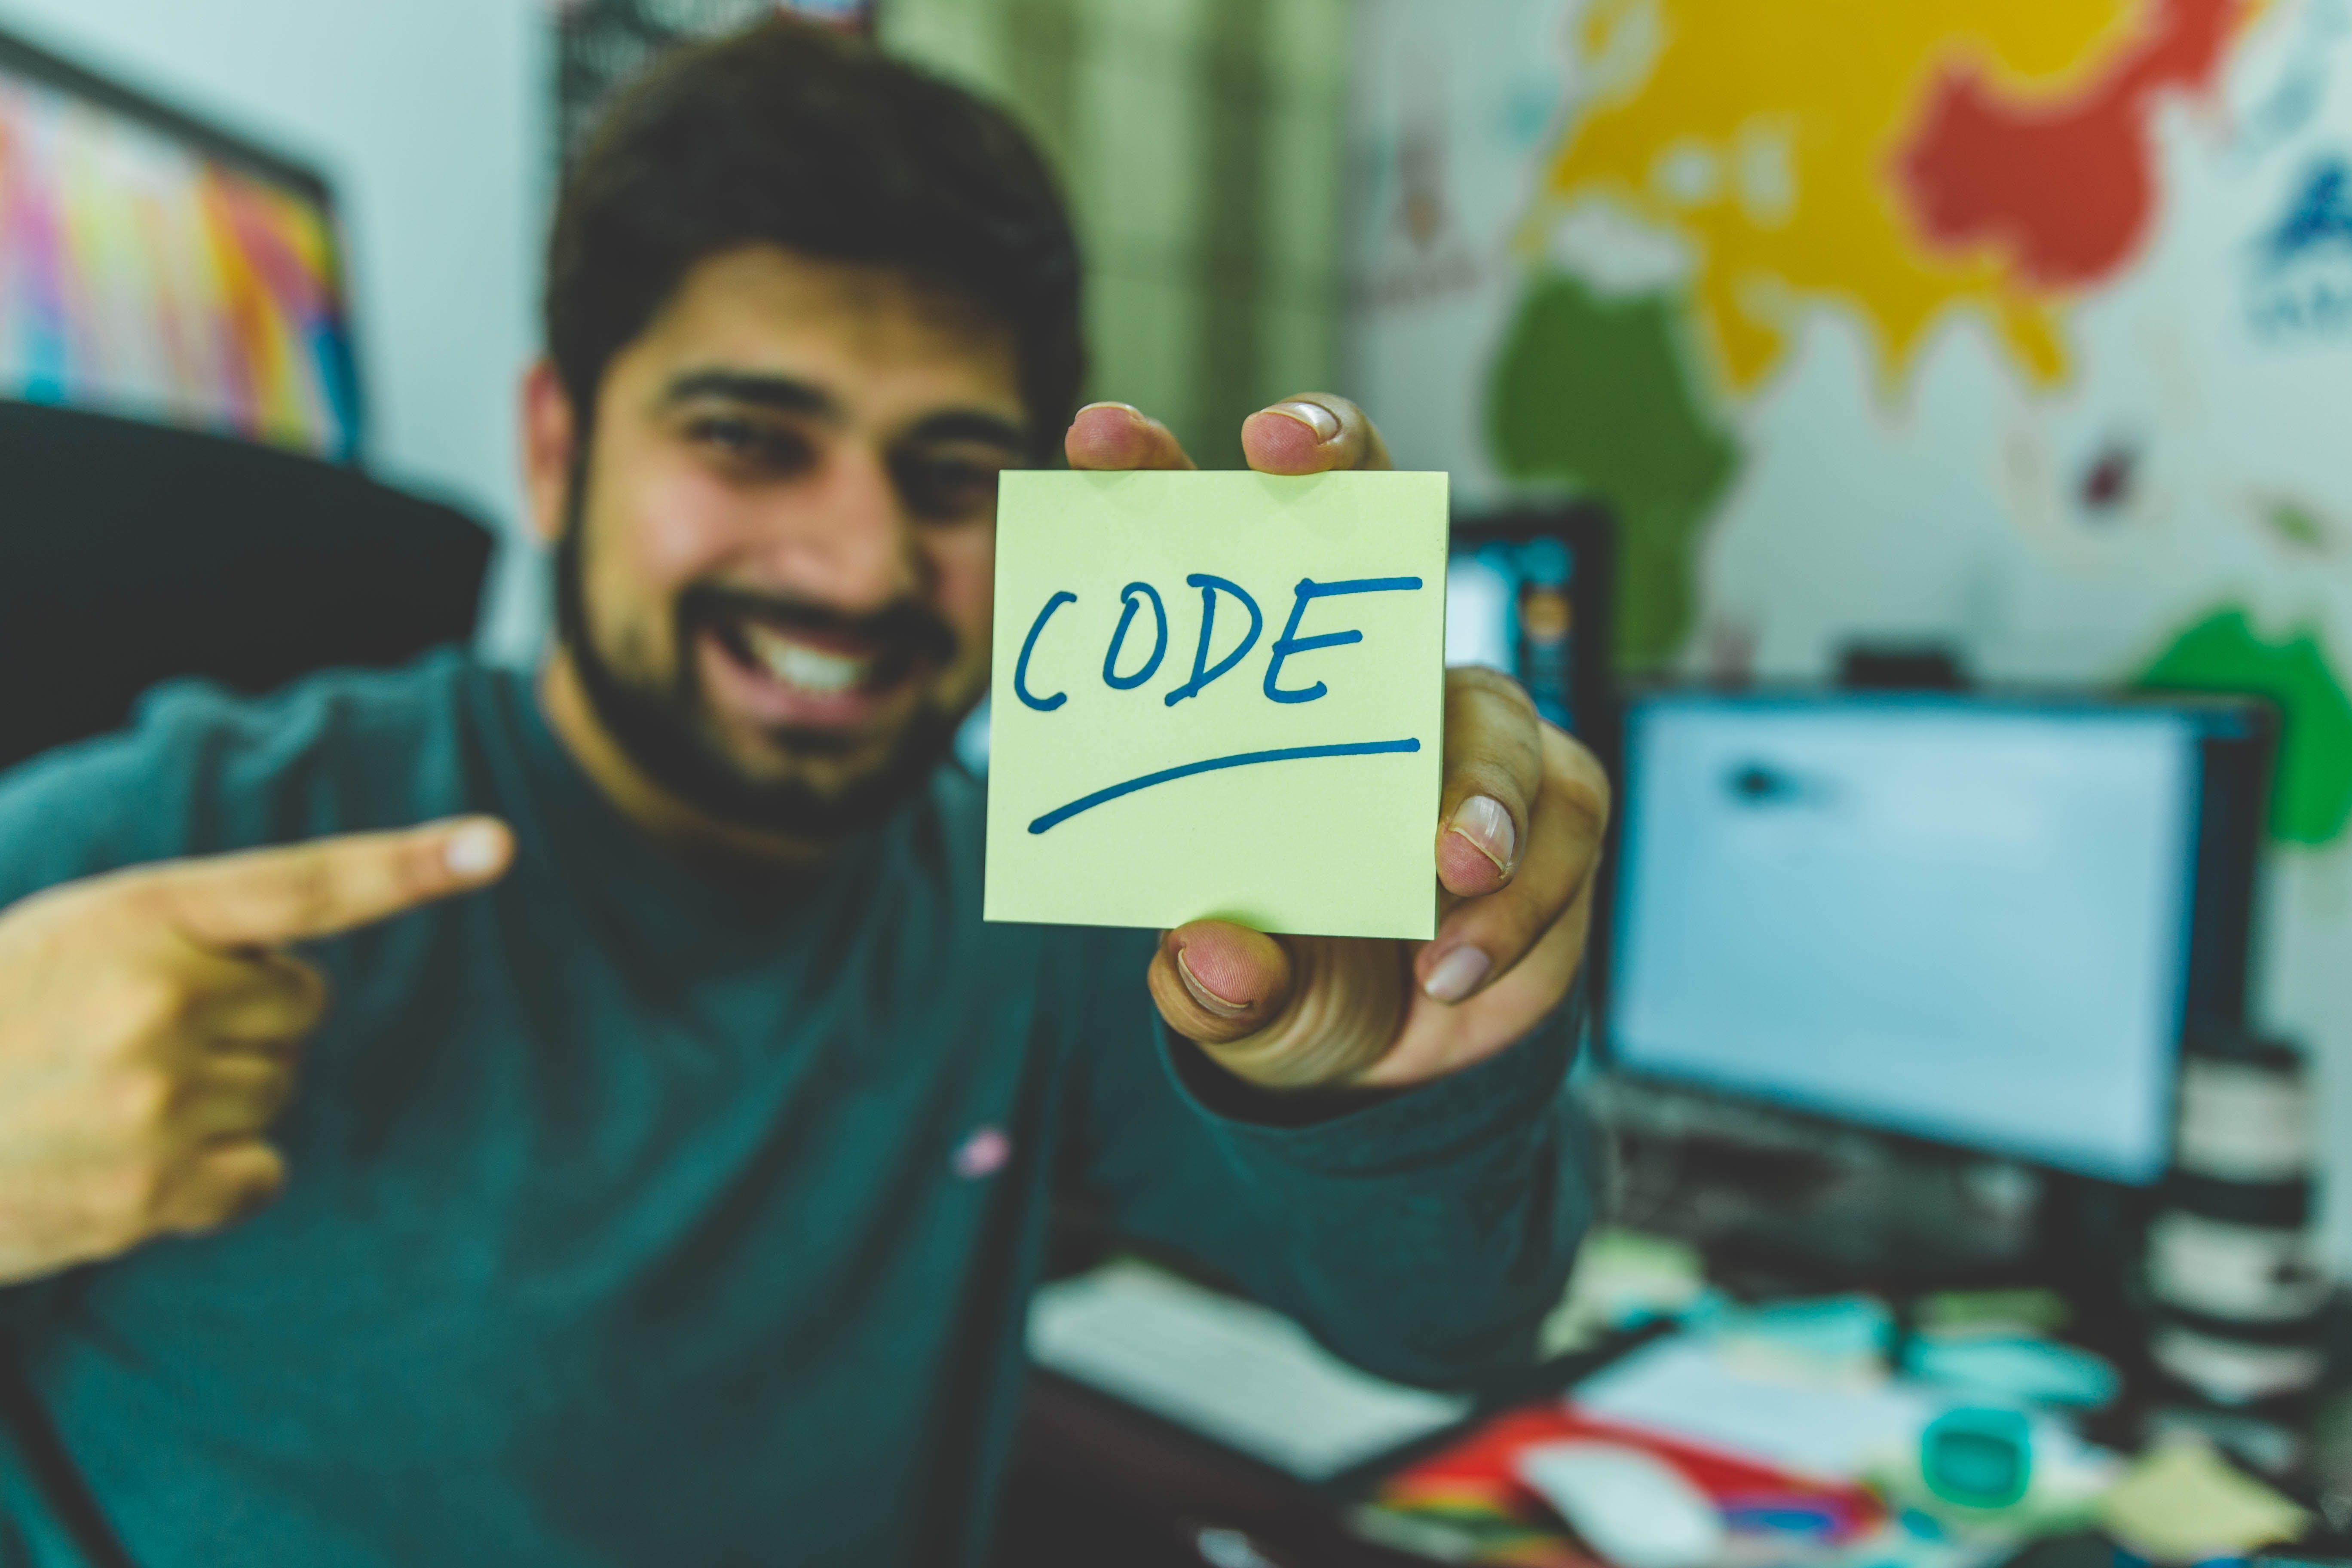 Kostenloses Stock Foto zu code, computer, haftnotiz, kodieren